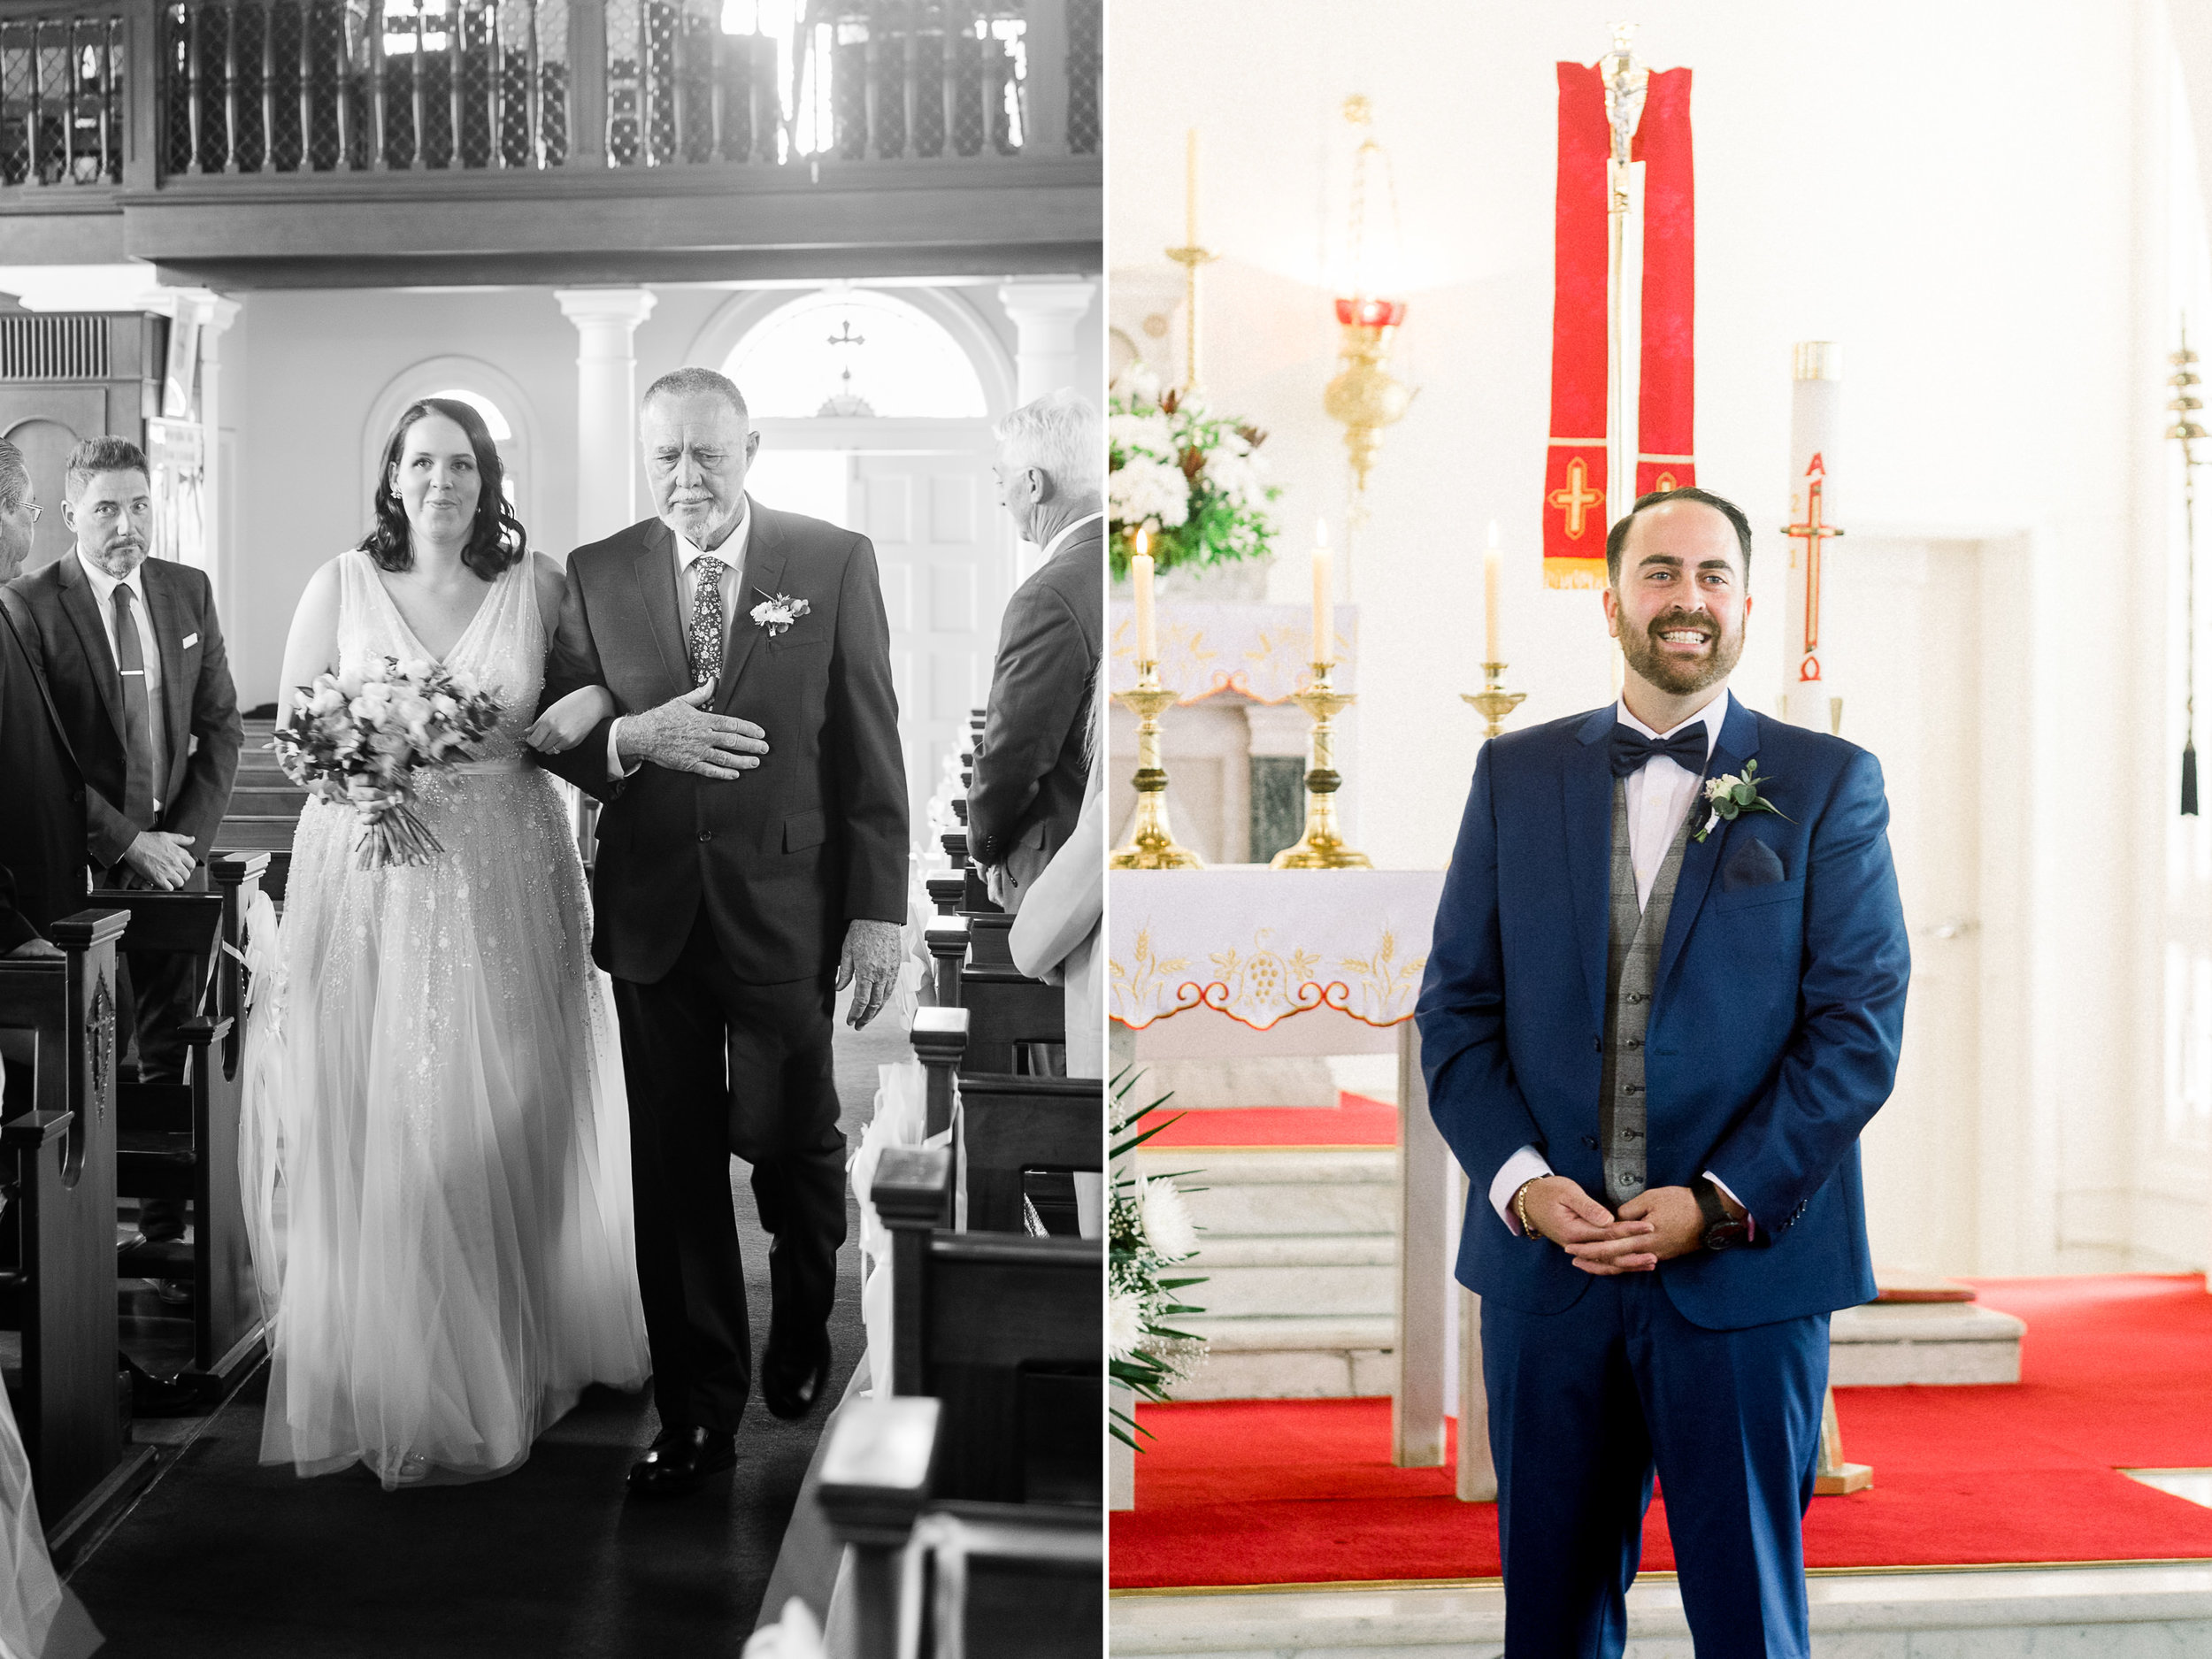 brisbane-city-wedding-church-ceremony-wedding-2.jpg